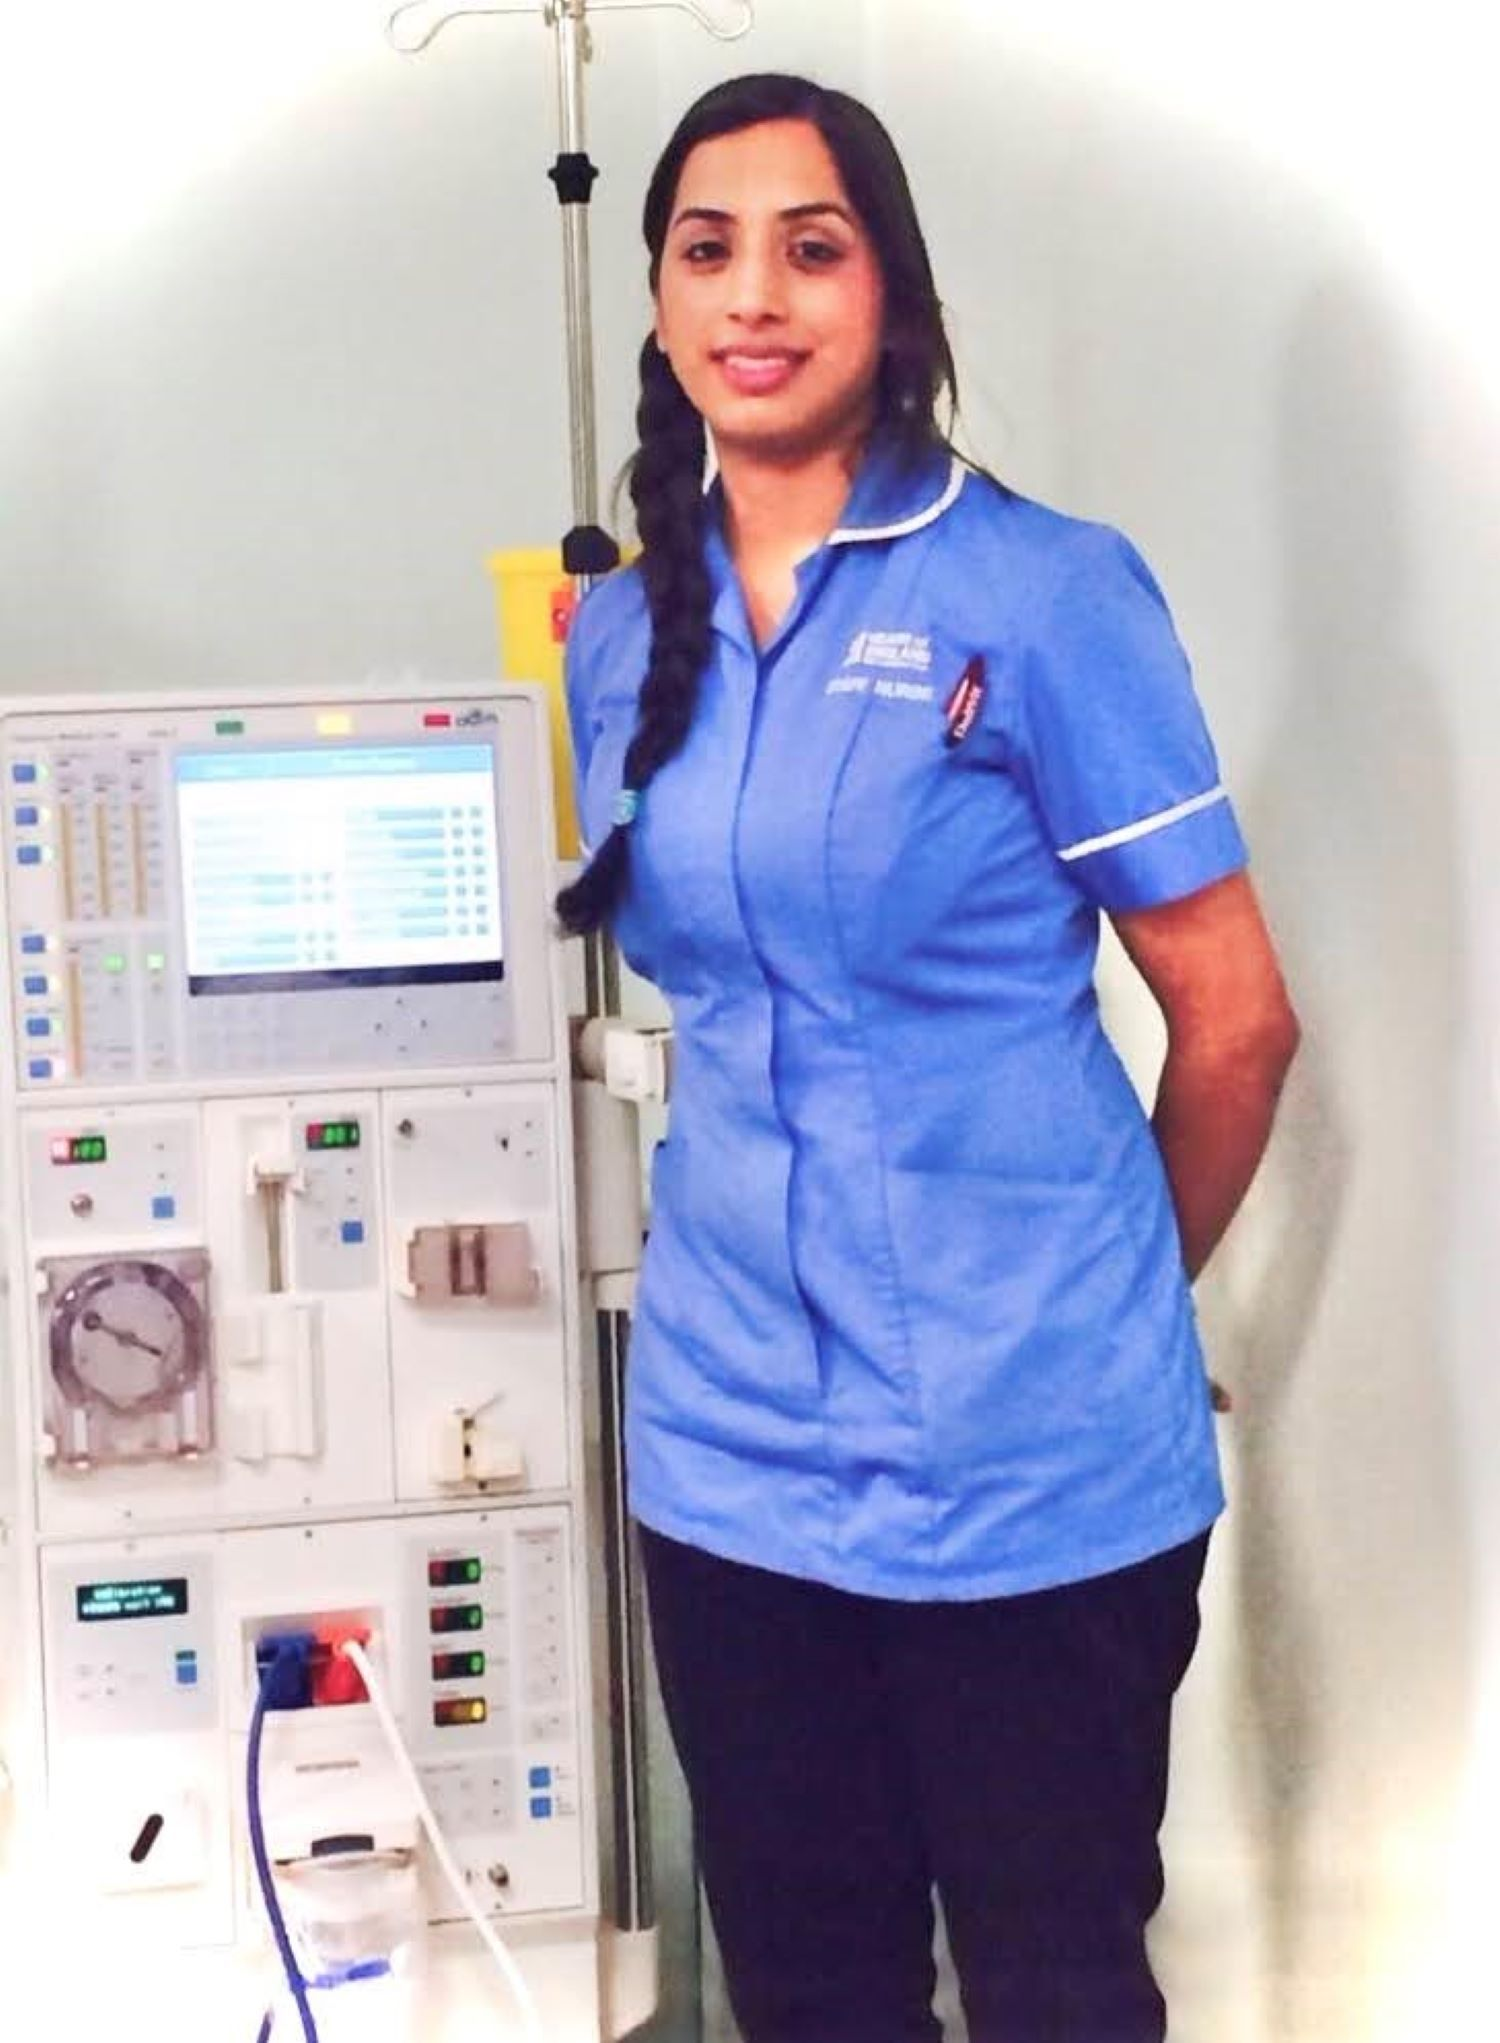 Salma Bi working as Haemodialysis Nurse   Twitter